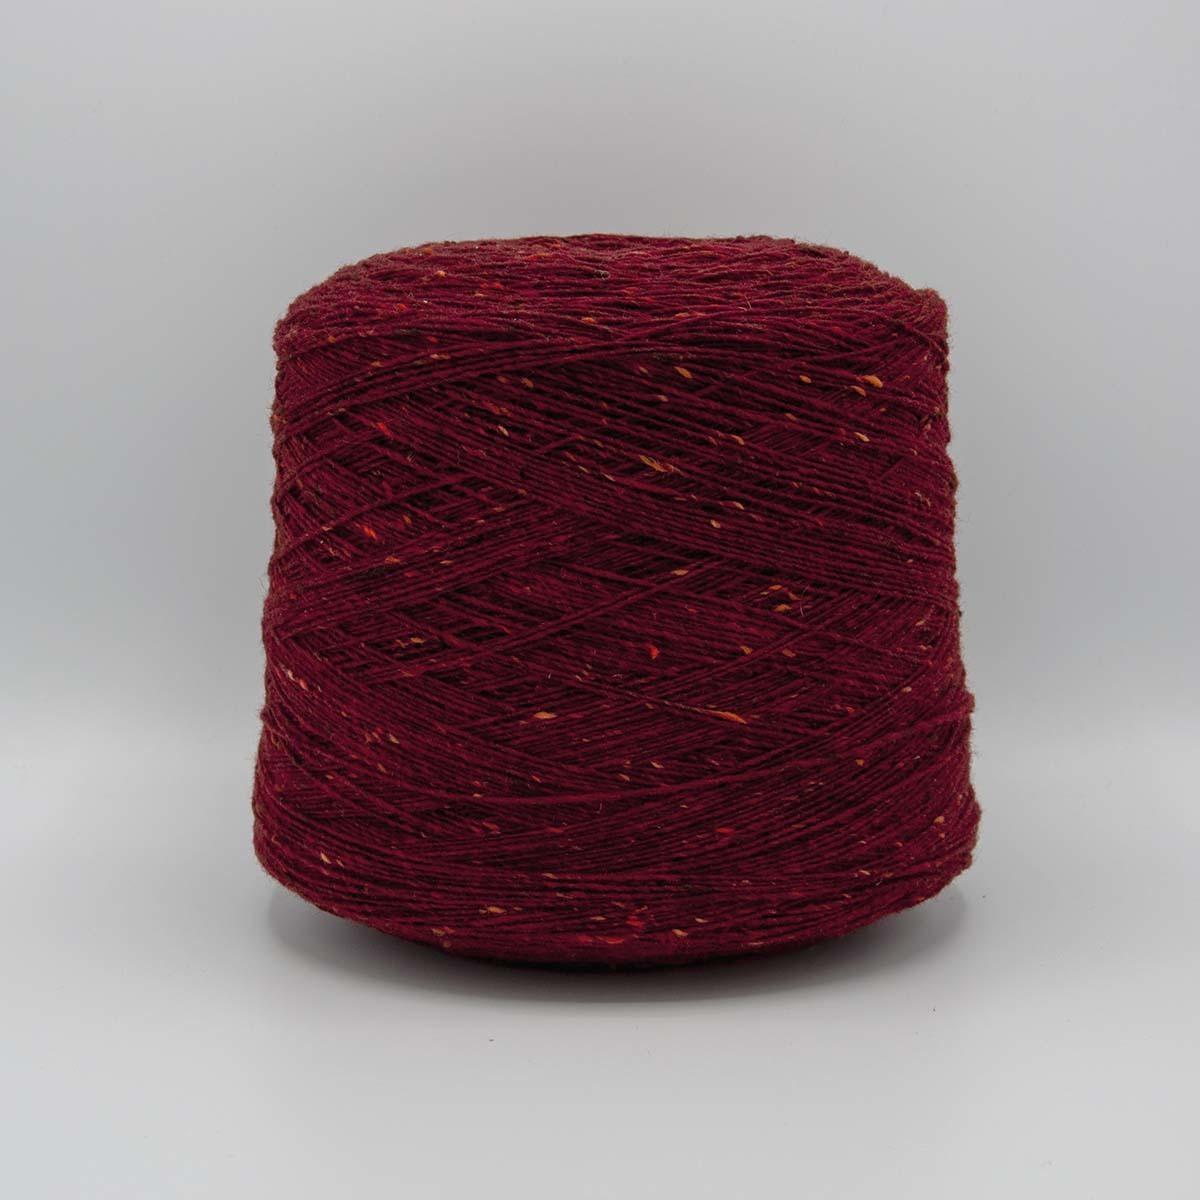 Knoll Yarns Soft Donegal (одинарный твид) - 5503